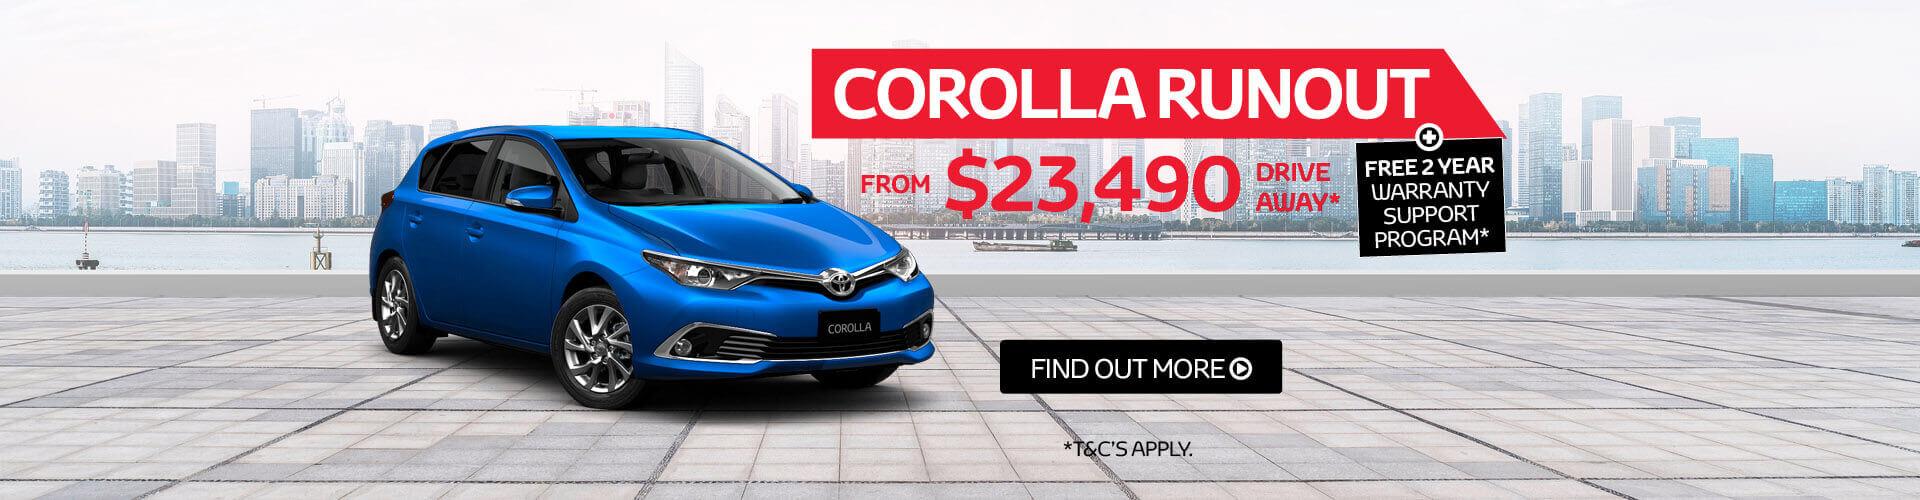 Corolla Runout Sale